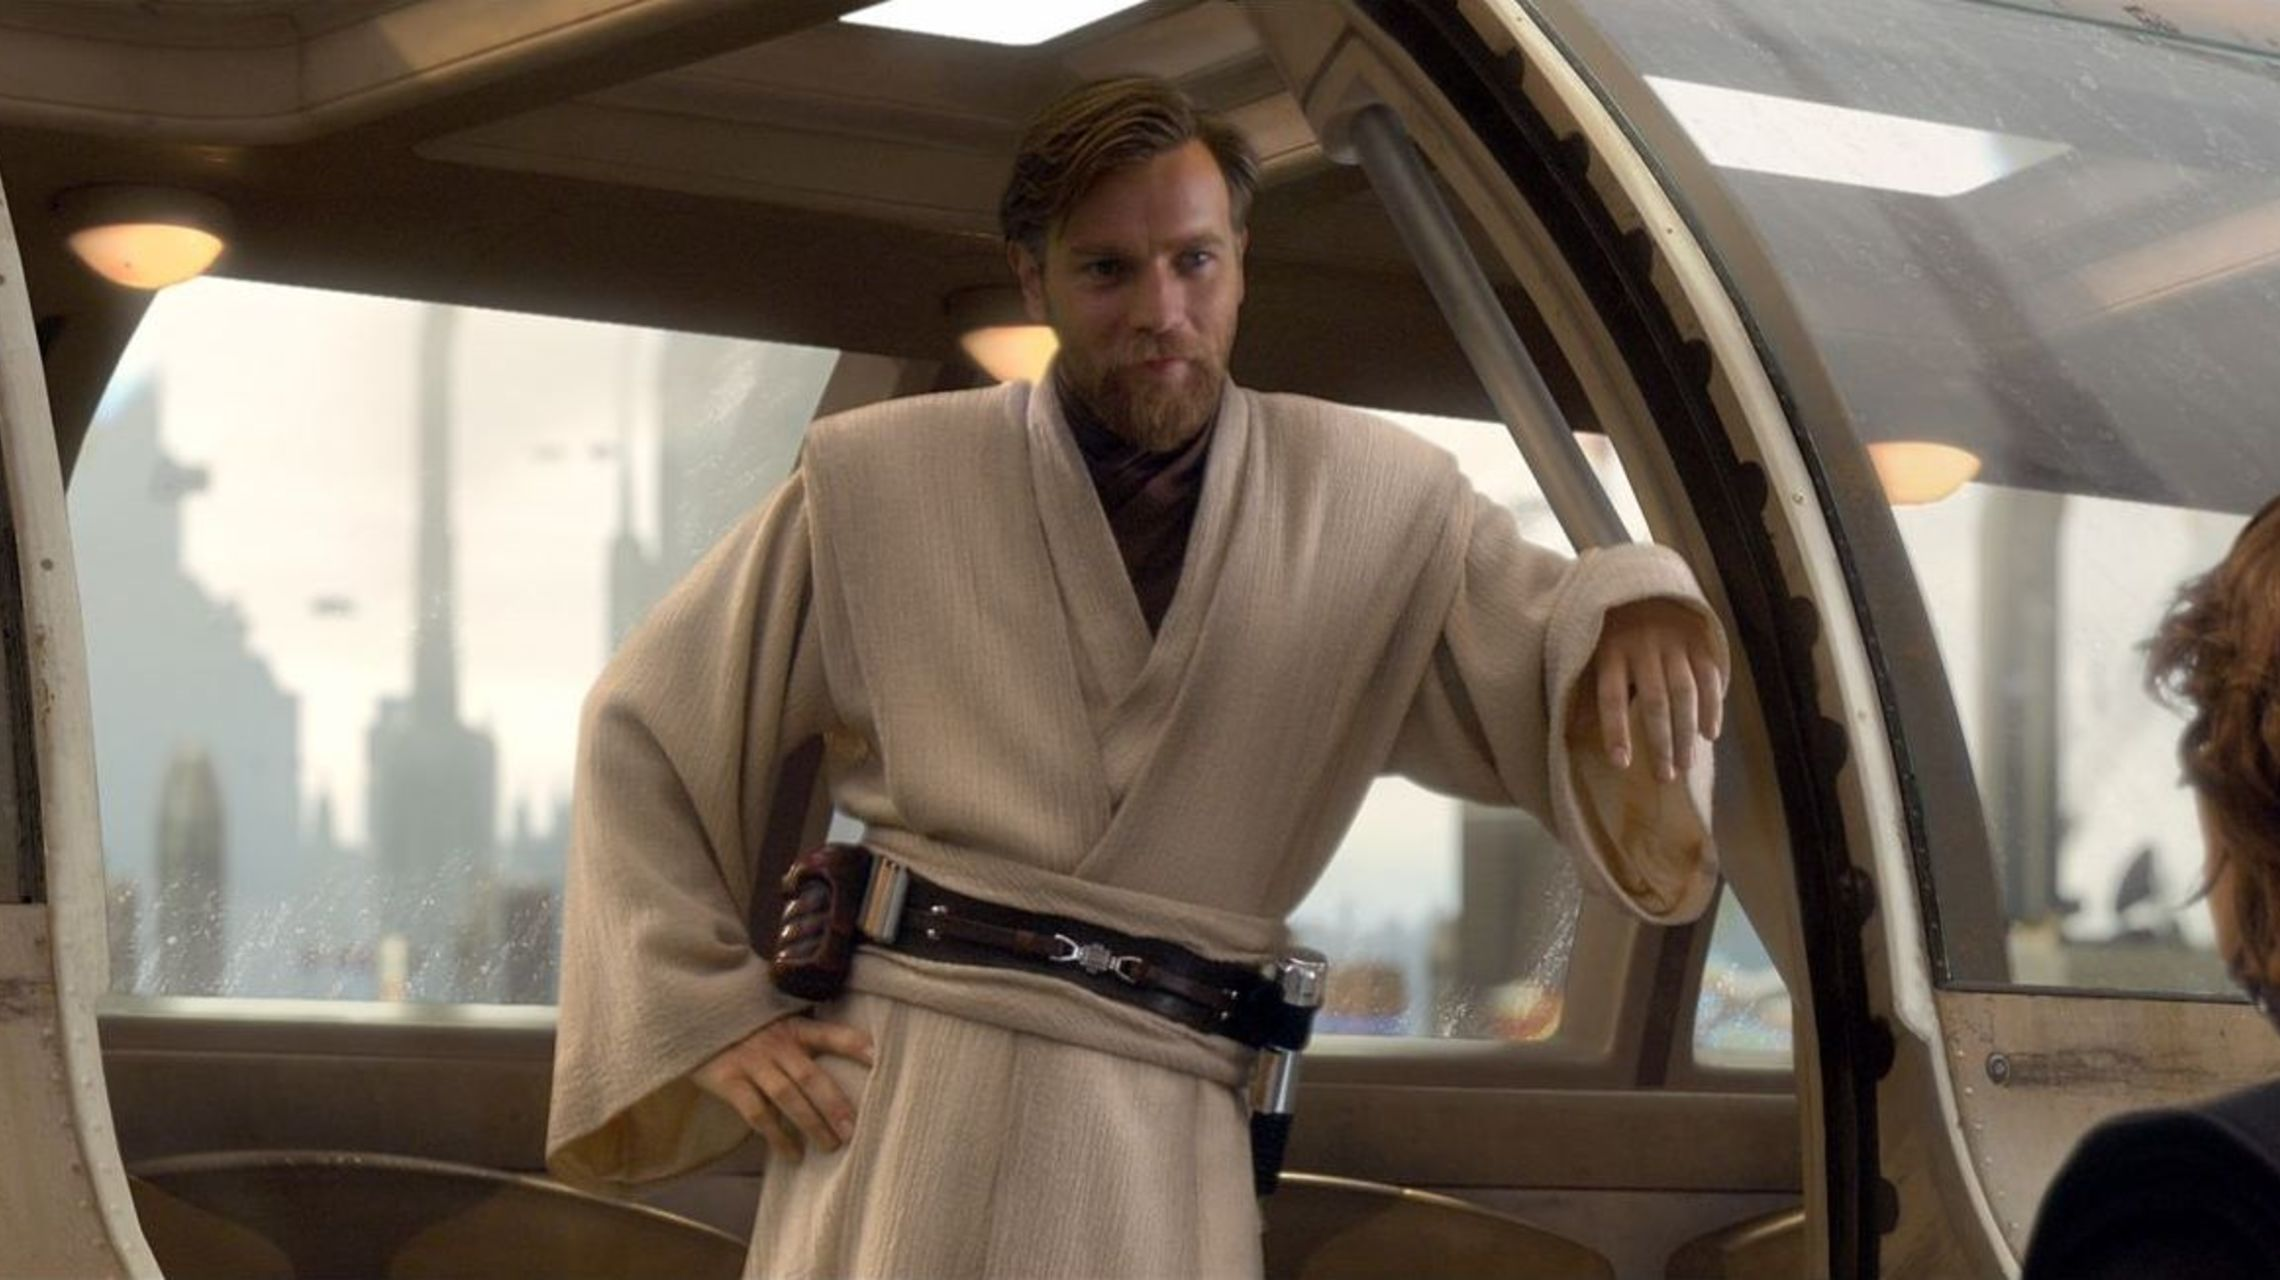 obi-wan kenobi luke skywalker